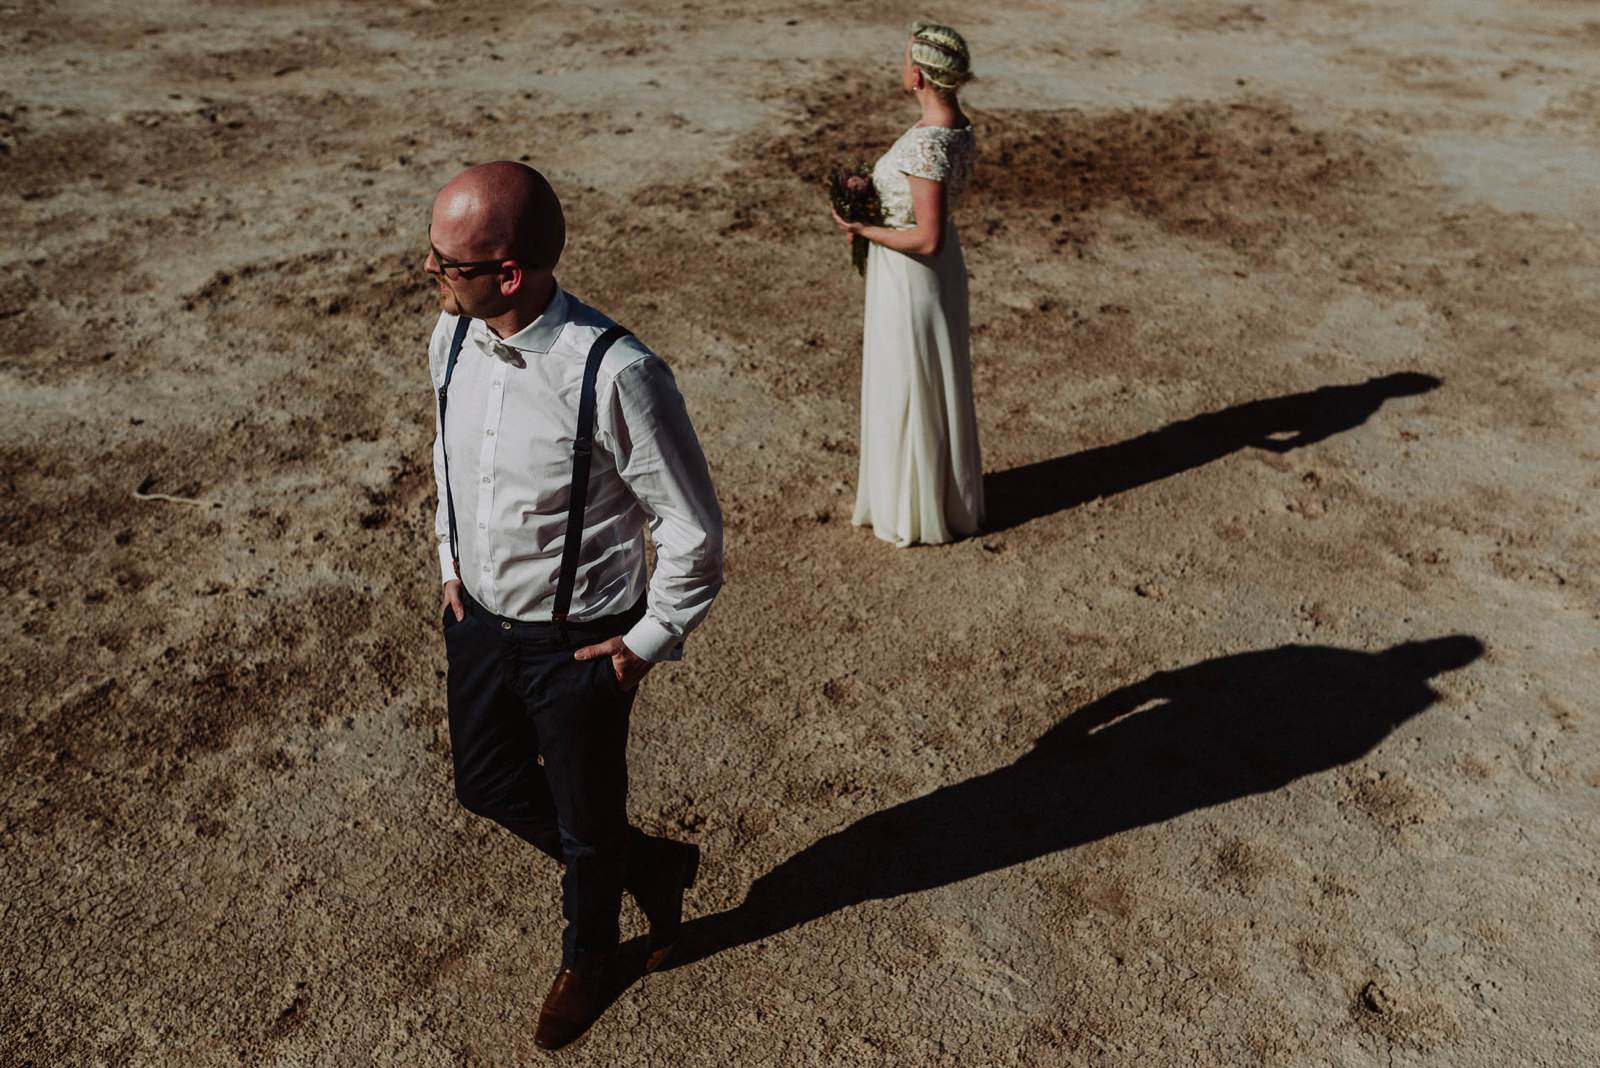 heiraten-in-namibia-1003.jpg